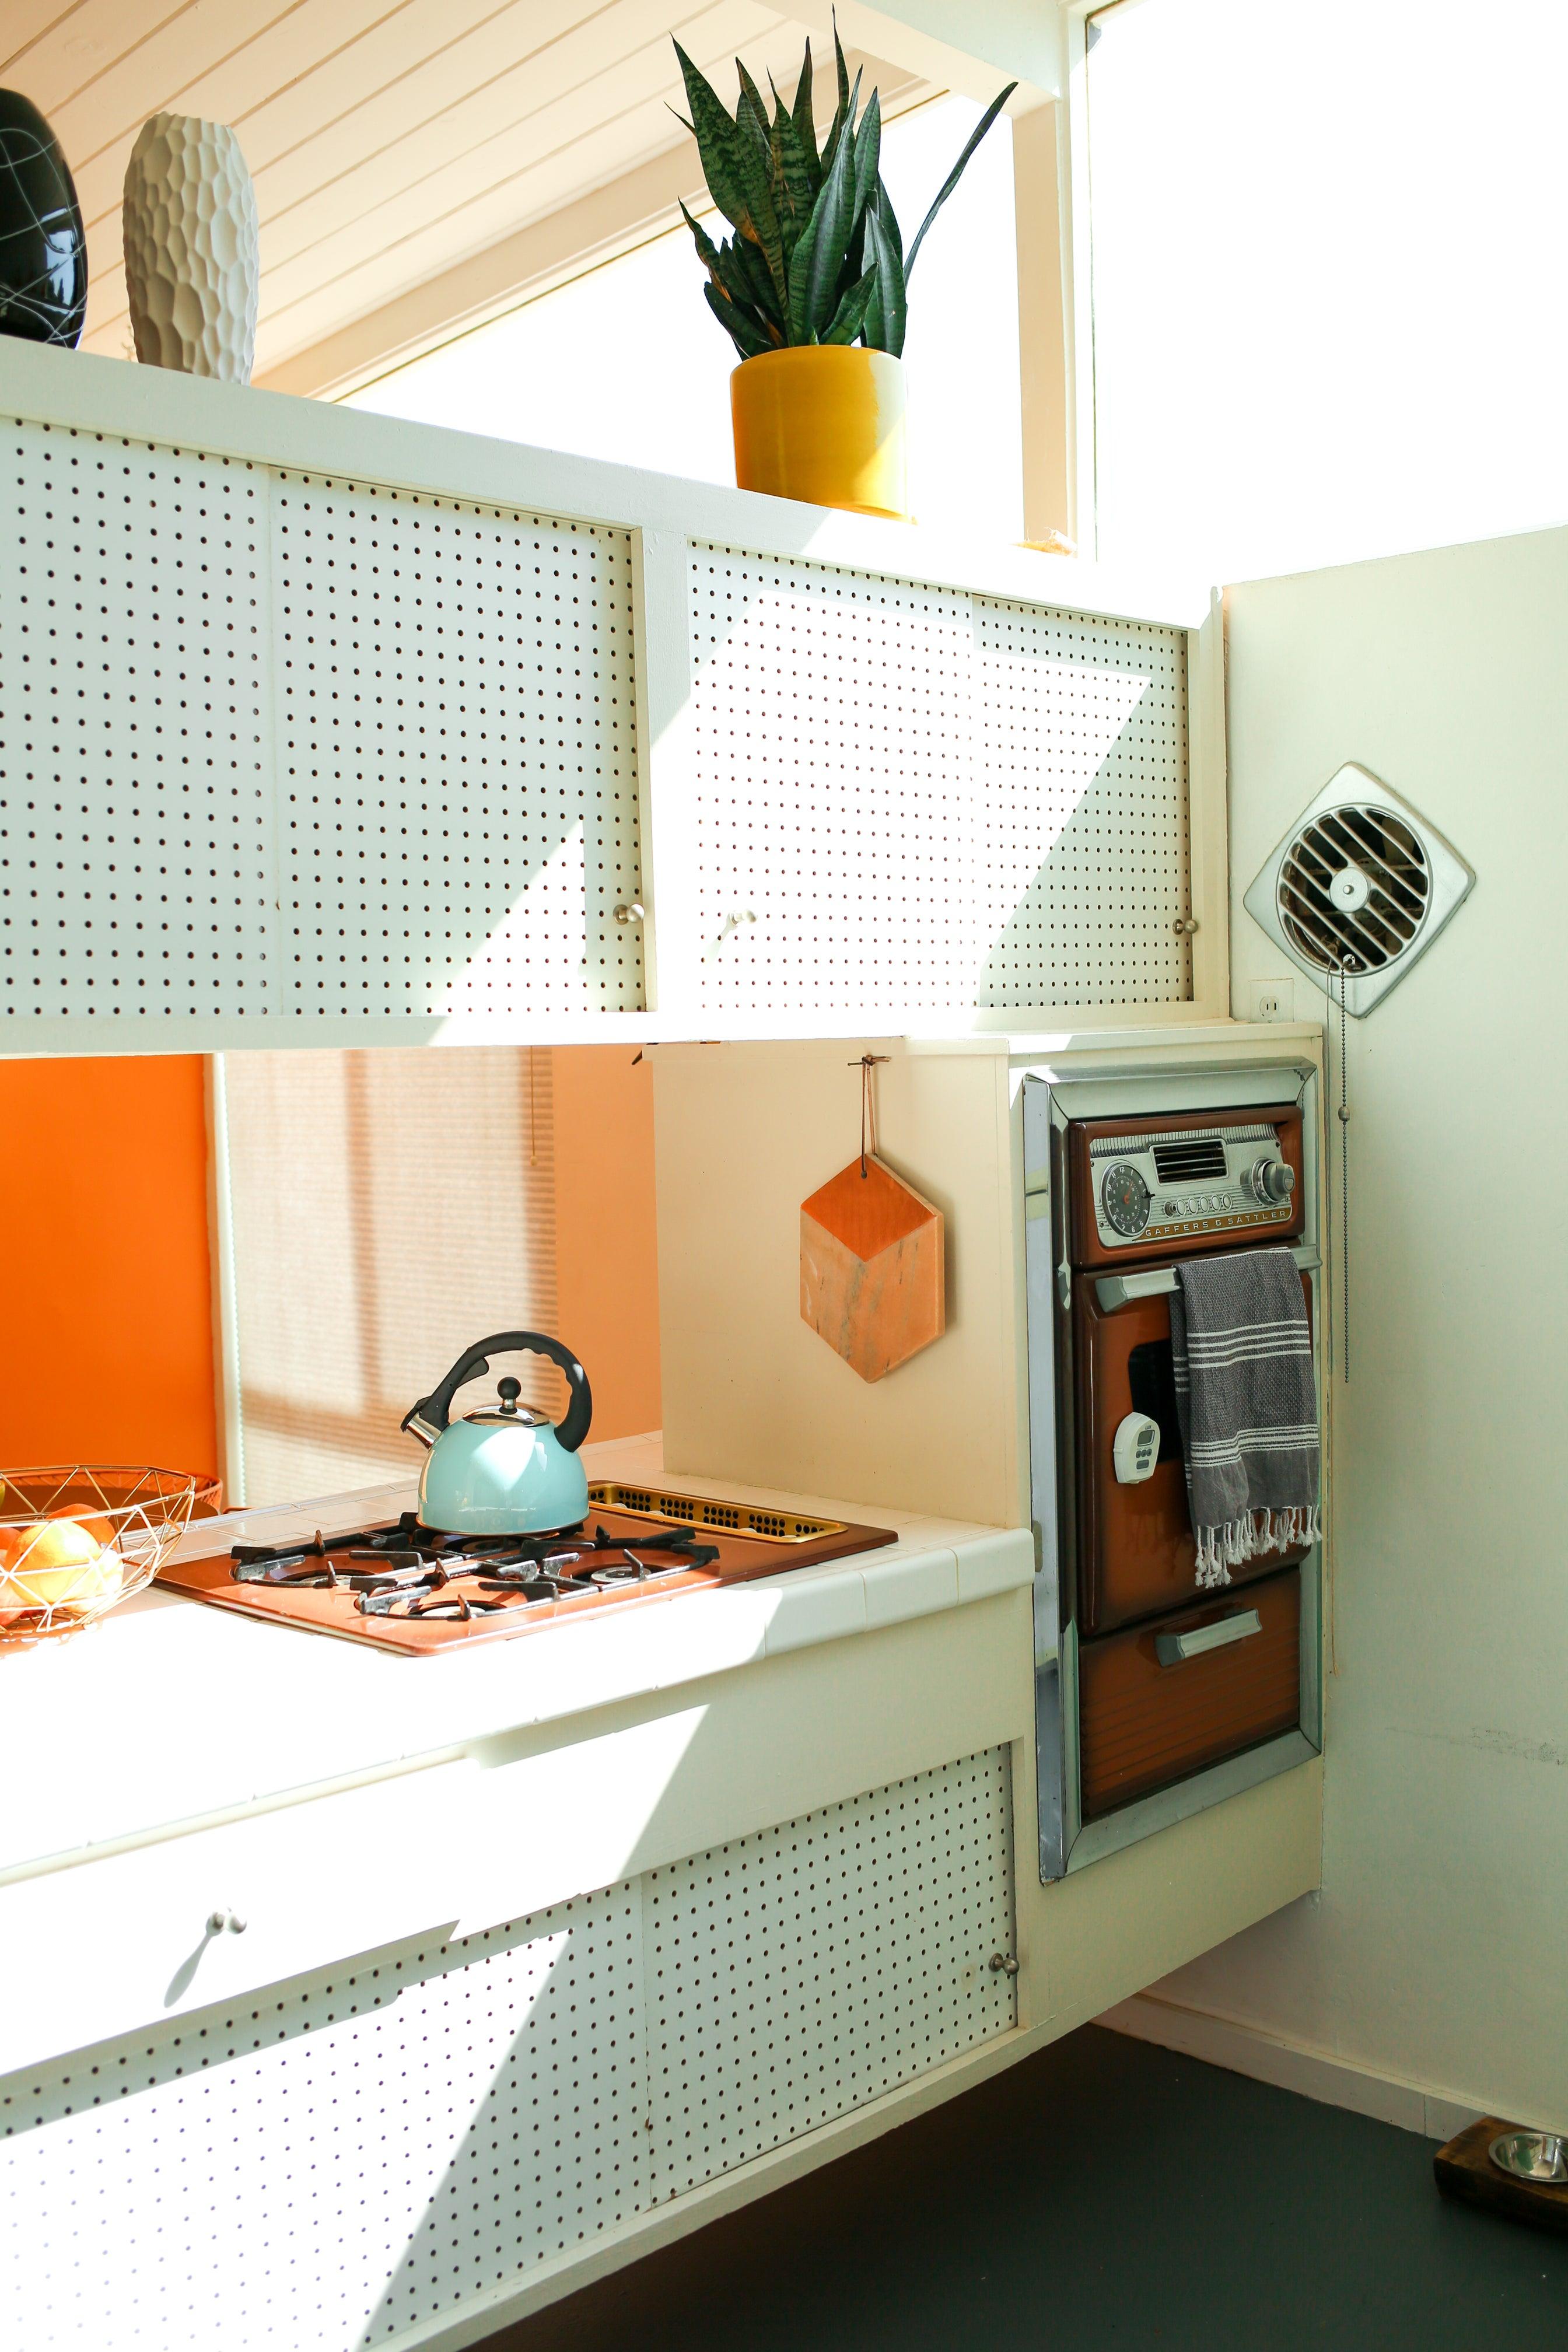 vintage kitchen oven